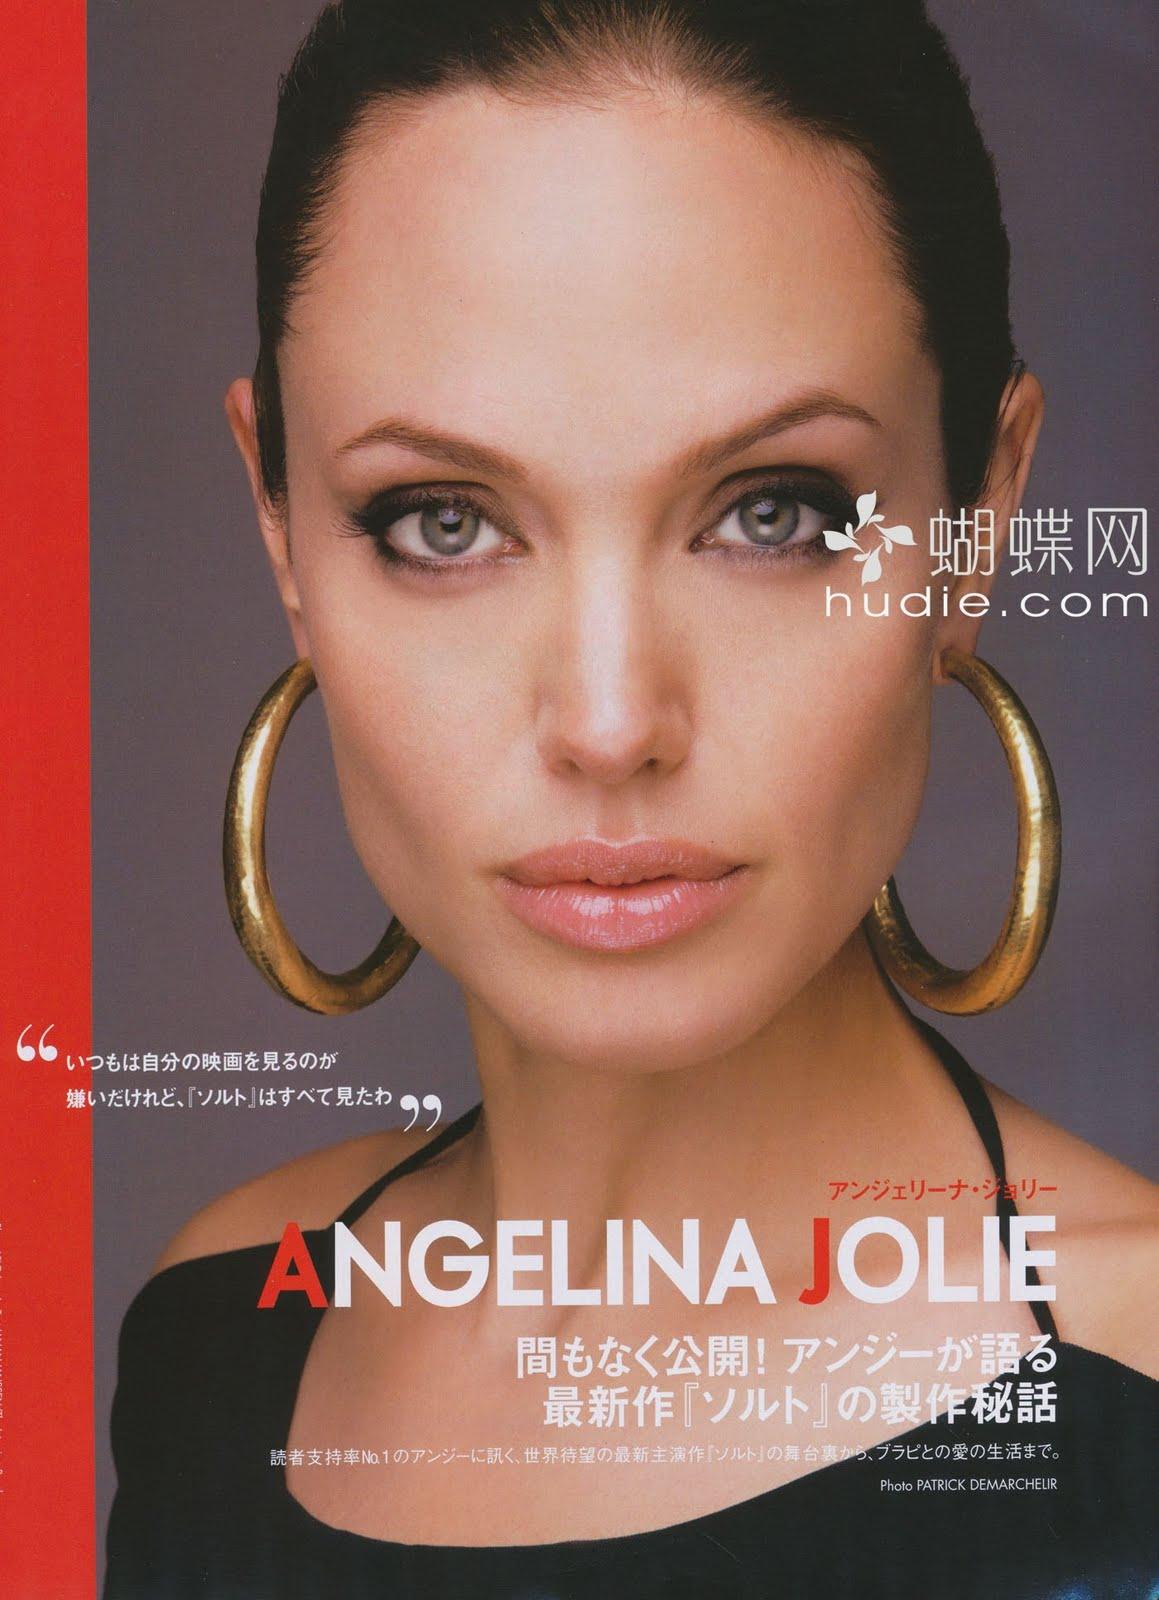 http://1.bp.blogspot.com/-f-EPnUnQirE/ThyFYrEwEEI/AAAAAAAAogA/yooVhjTBIhM/s1600/Angelina%2BJolie%2B%255BPart3%255D%2B%252814%2529.jpg